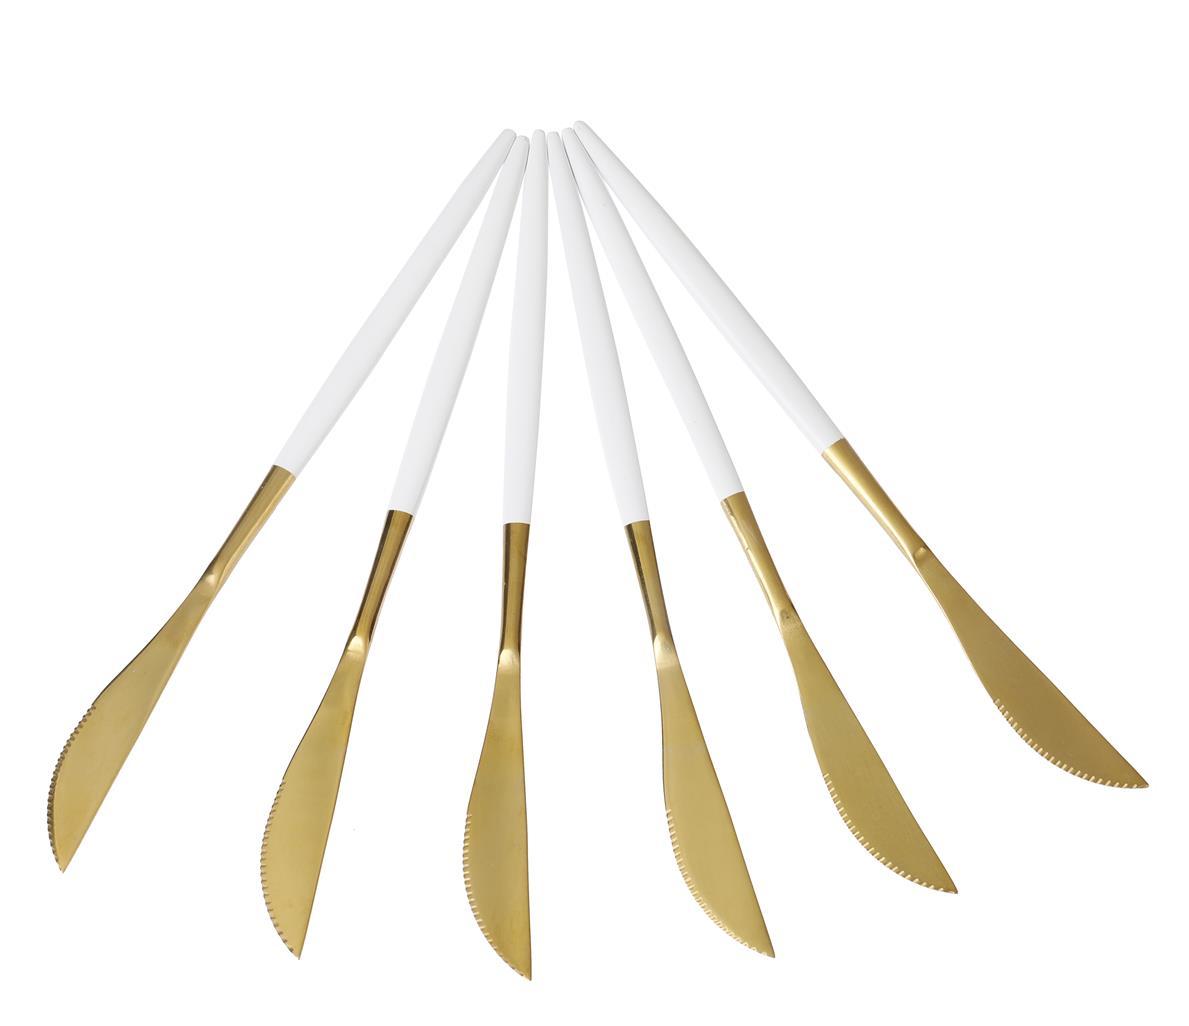 Faca Lux Branco 6 peças